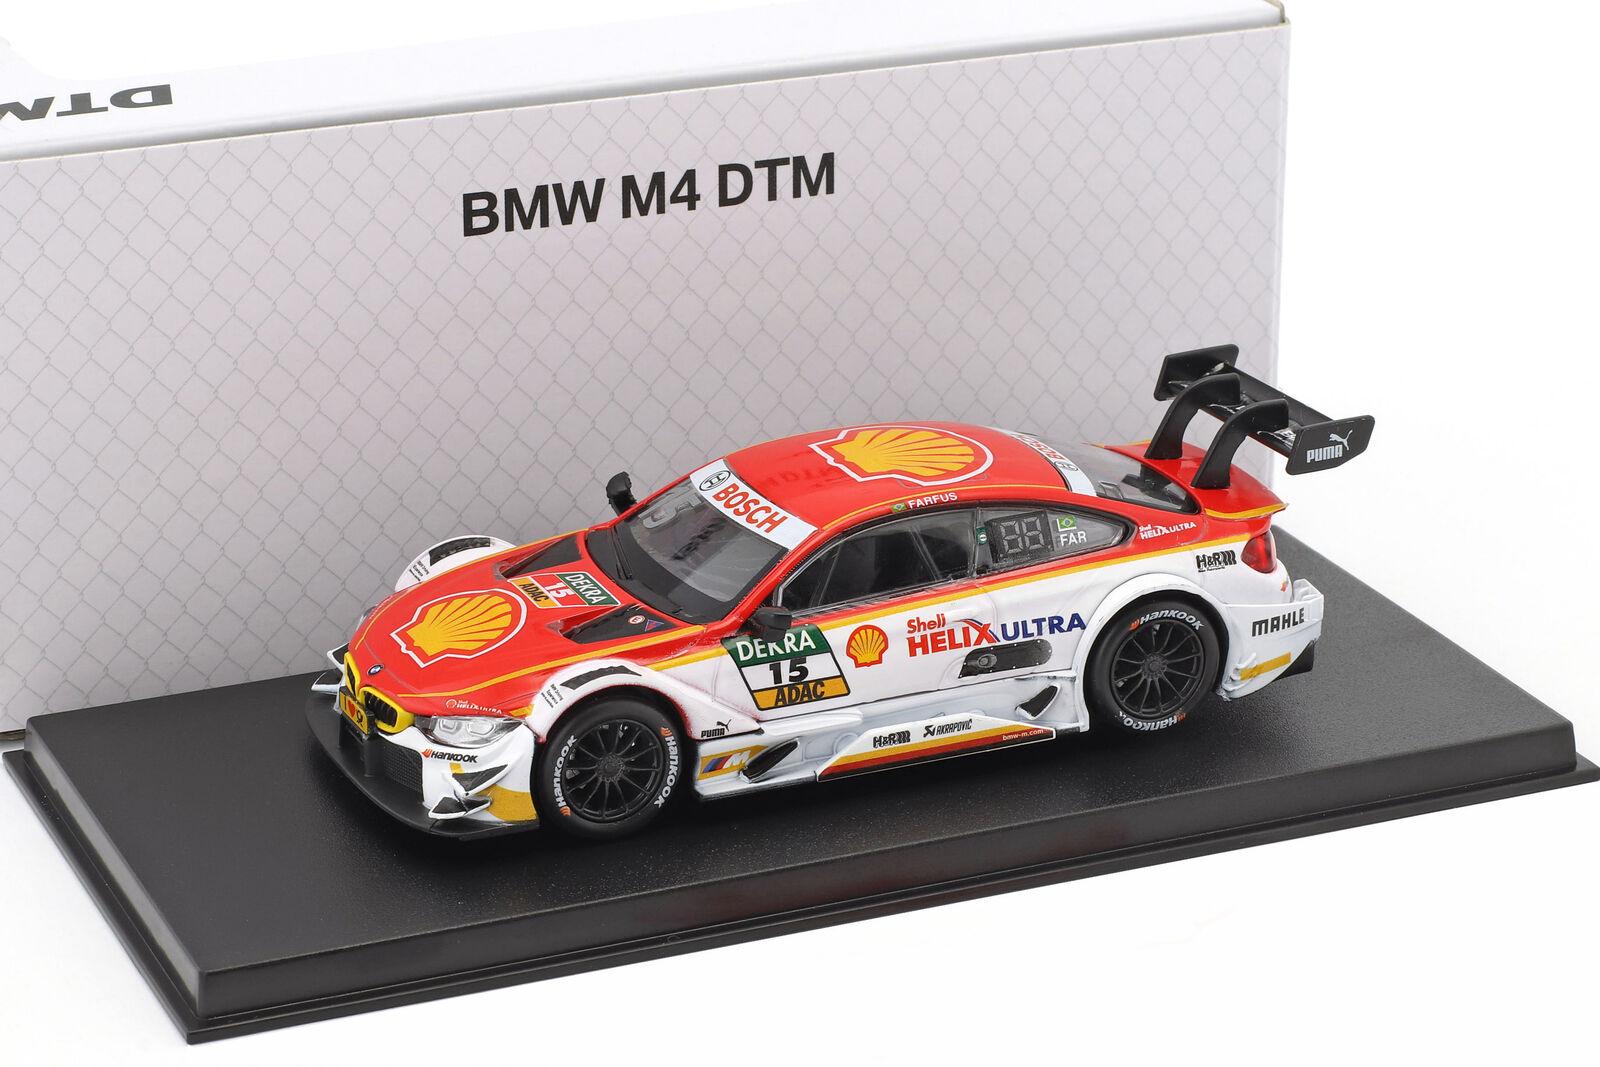 BMW m4 DTM  15 DTM 2017 Augusto Farfus BMW équipe marchandises 1 43 Herpa